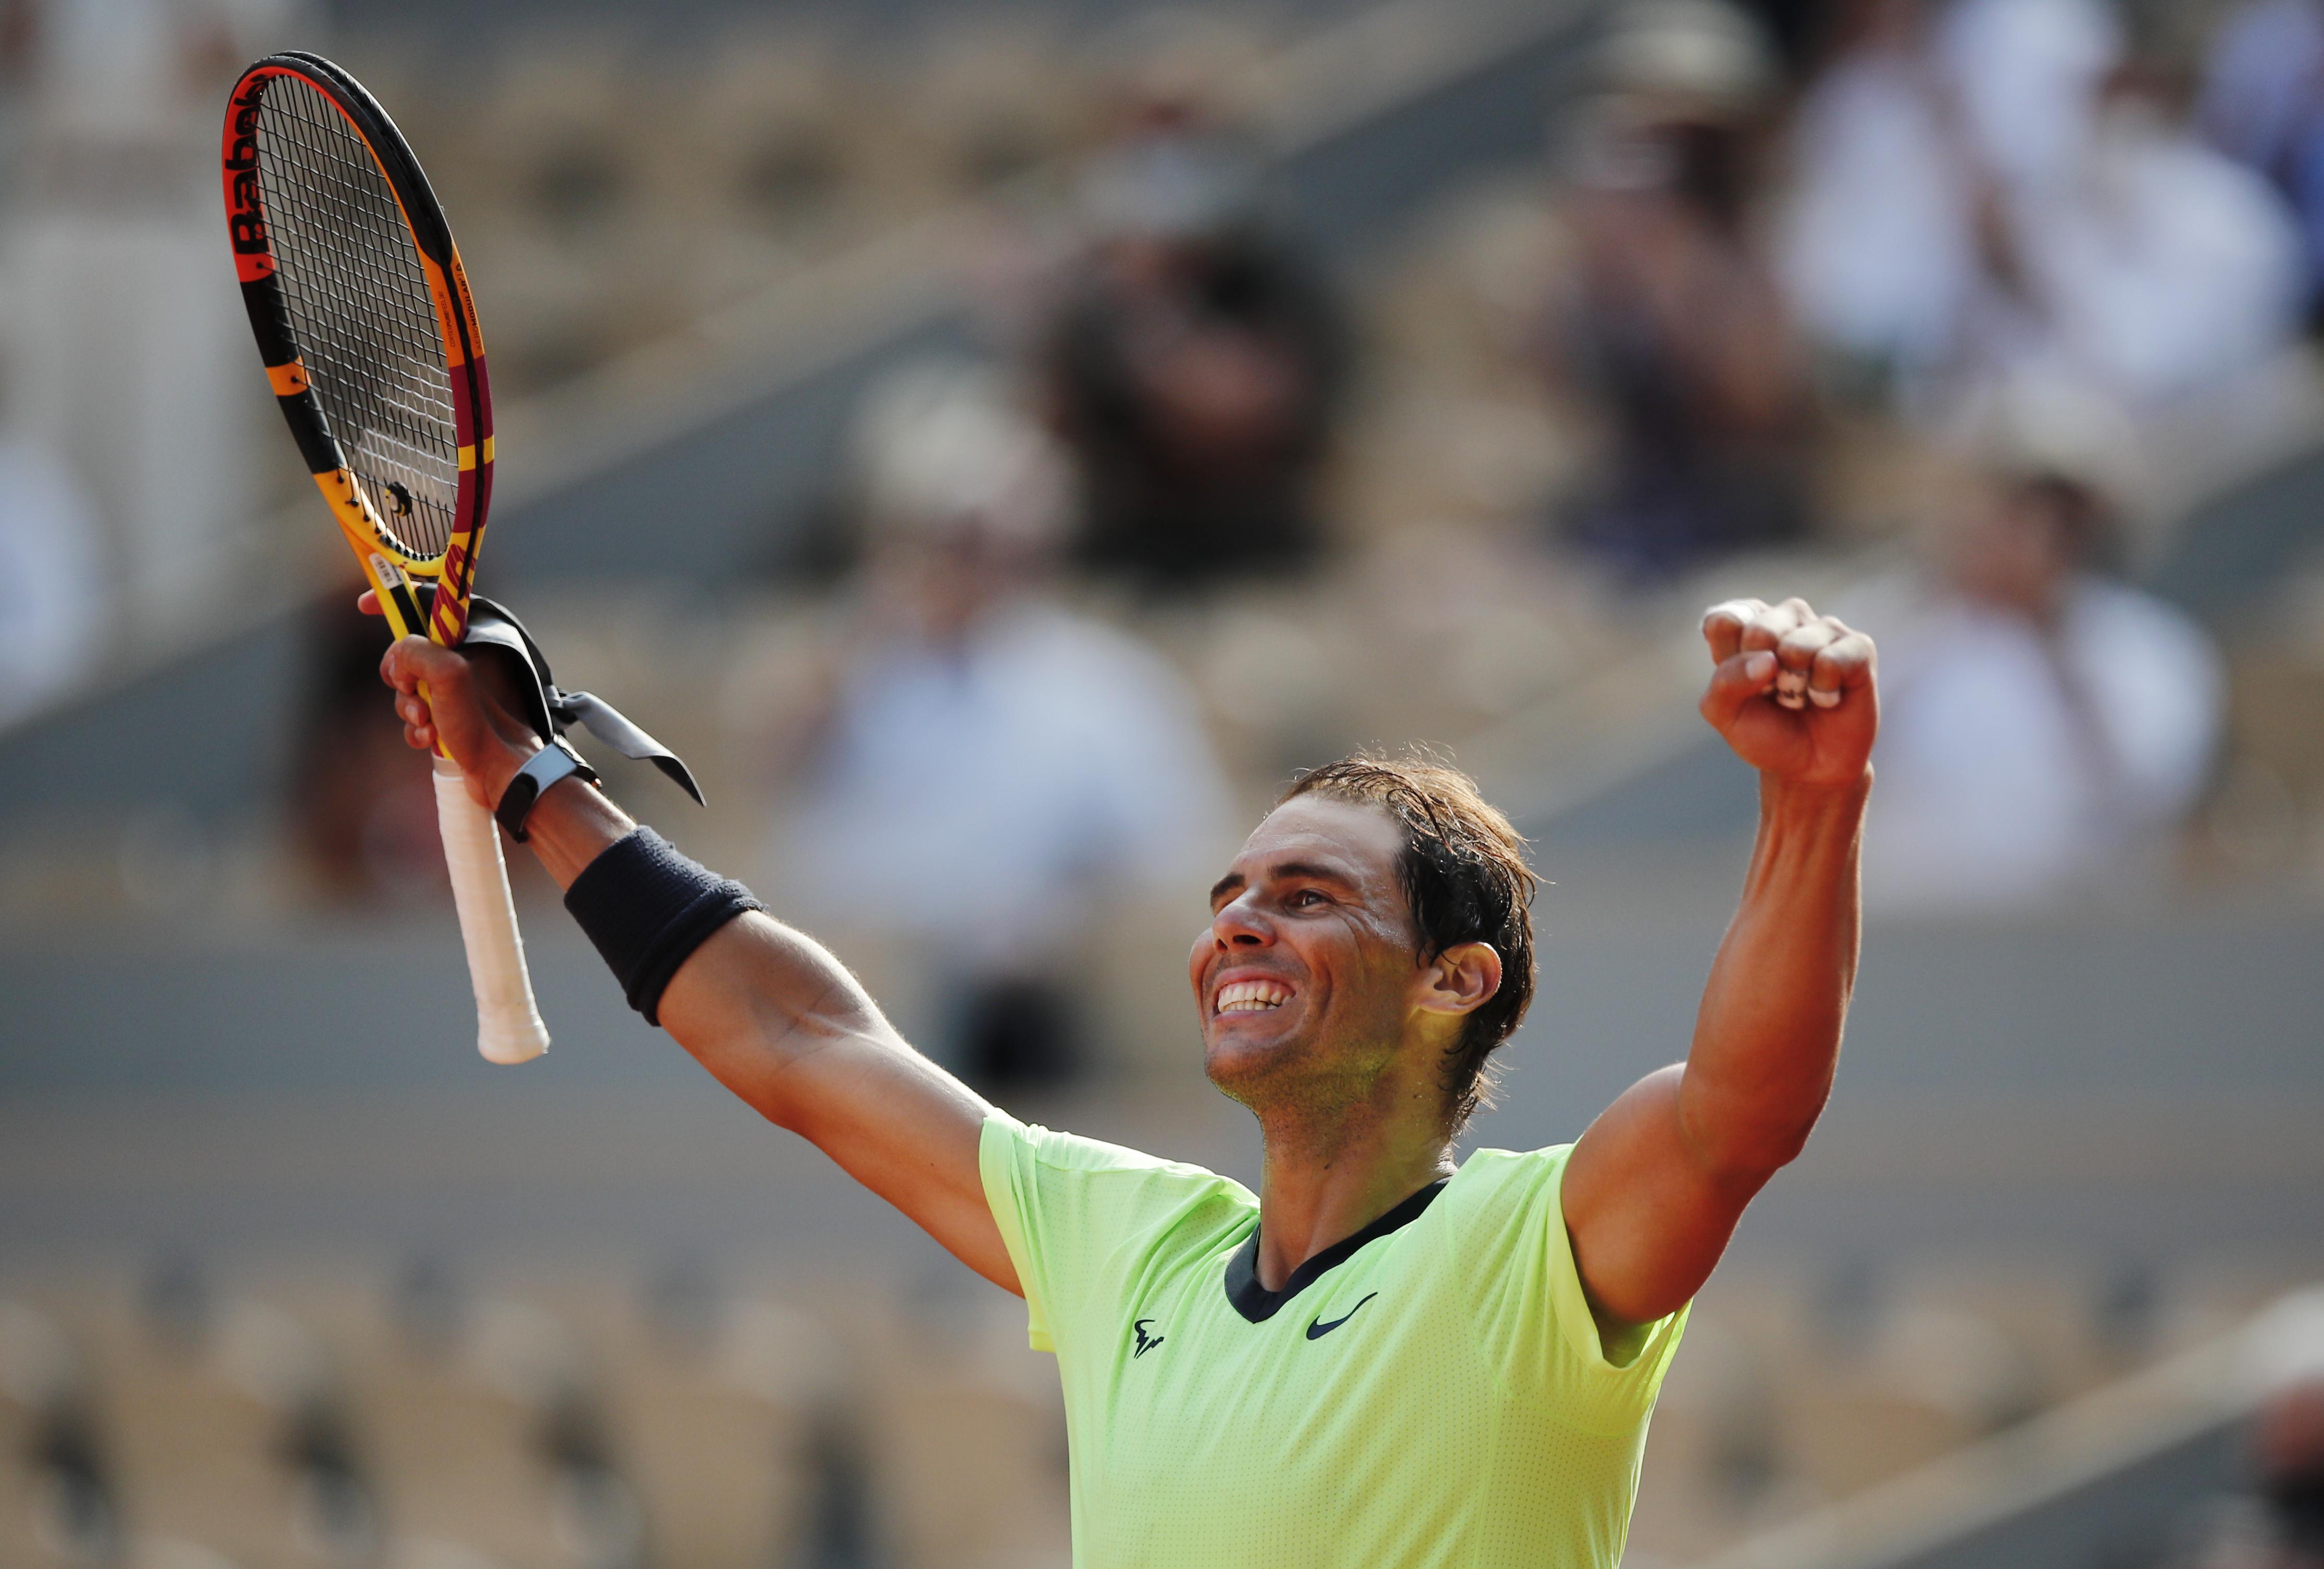 Tennis - French Open - Roland Garros, Paris, France - June 9, 2021  Spain's Rafael Nadal celebrates winning his quarter final match against Argentina's Diego Schwartzman REUTERS/Benoit Tessier